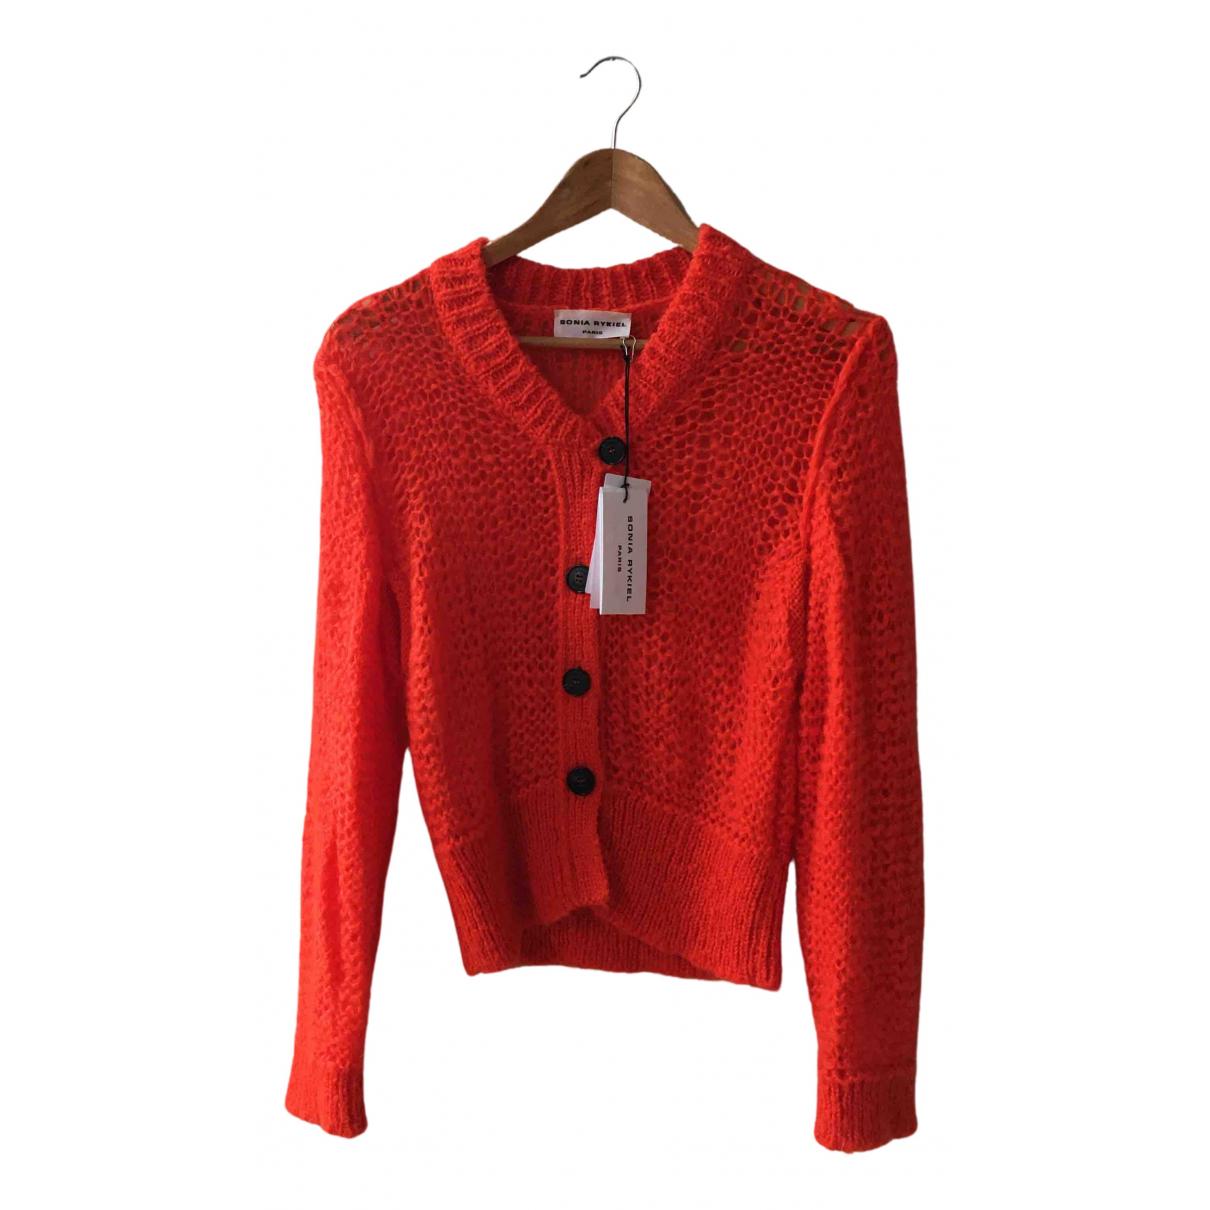 Sonia Rykiel - Pull   pour femme en laine - orange